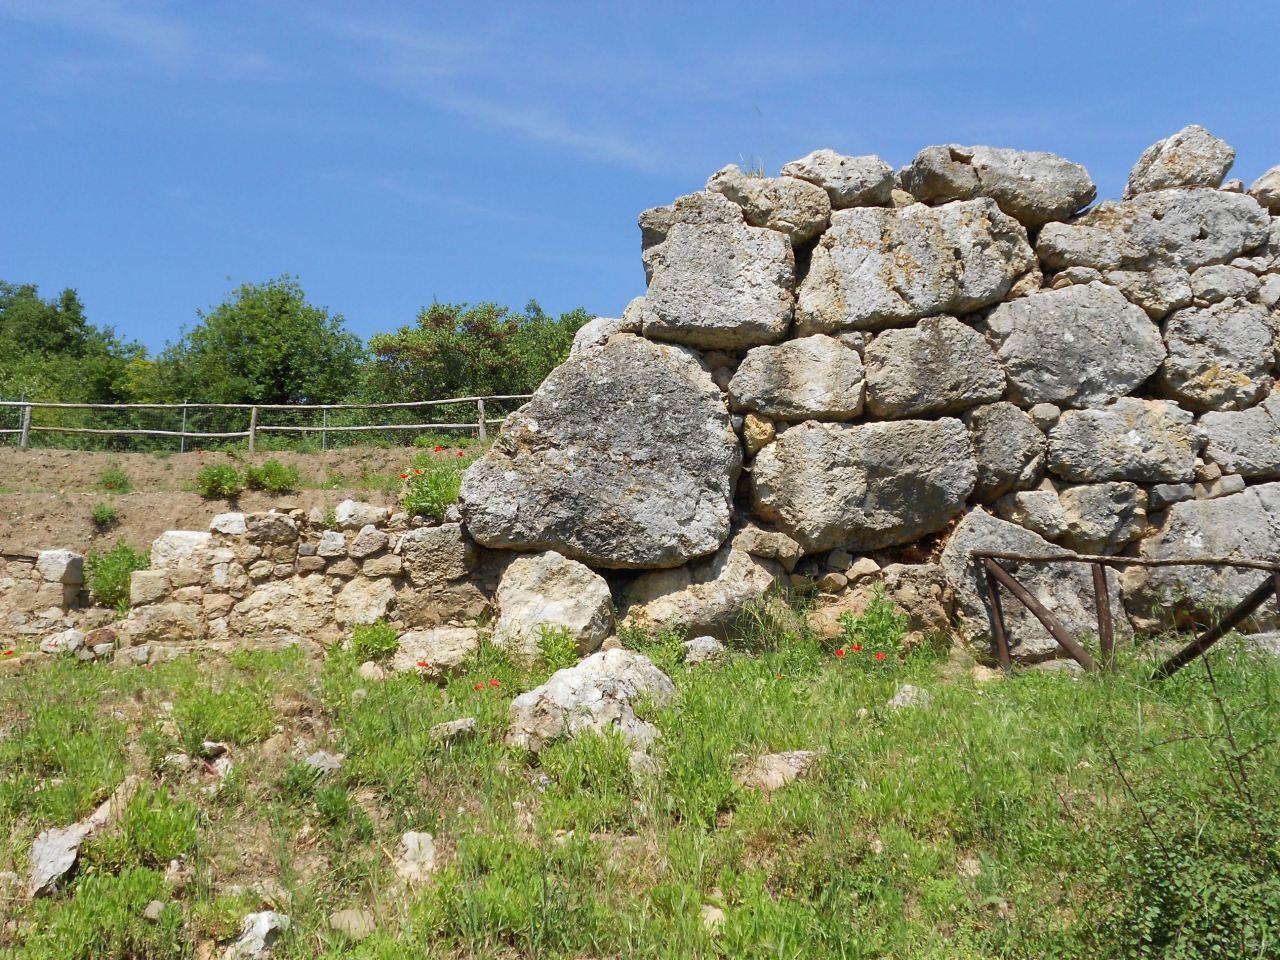 Roselle-Mura-Megalitiche-Roselle-Grosseto-Toscana-Italia-36